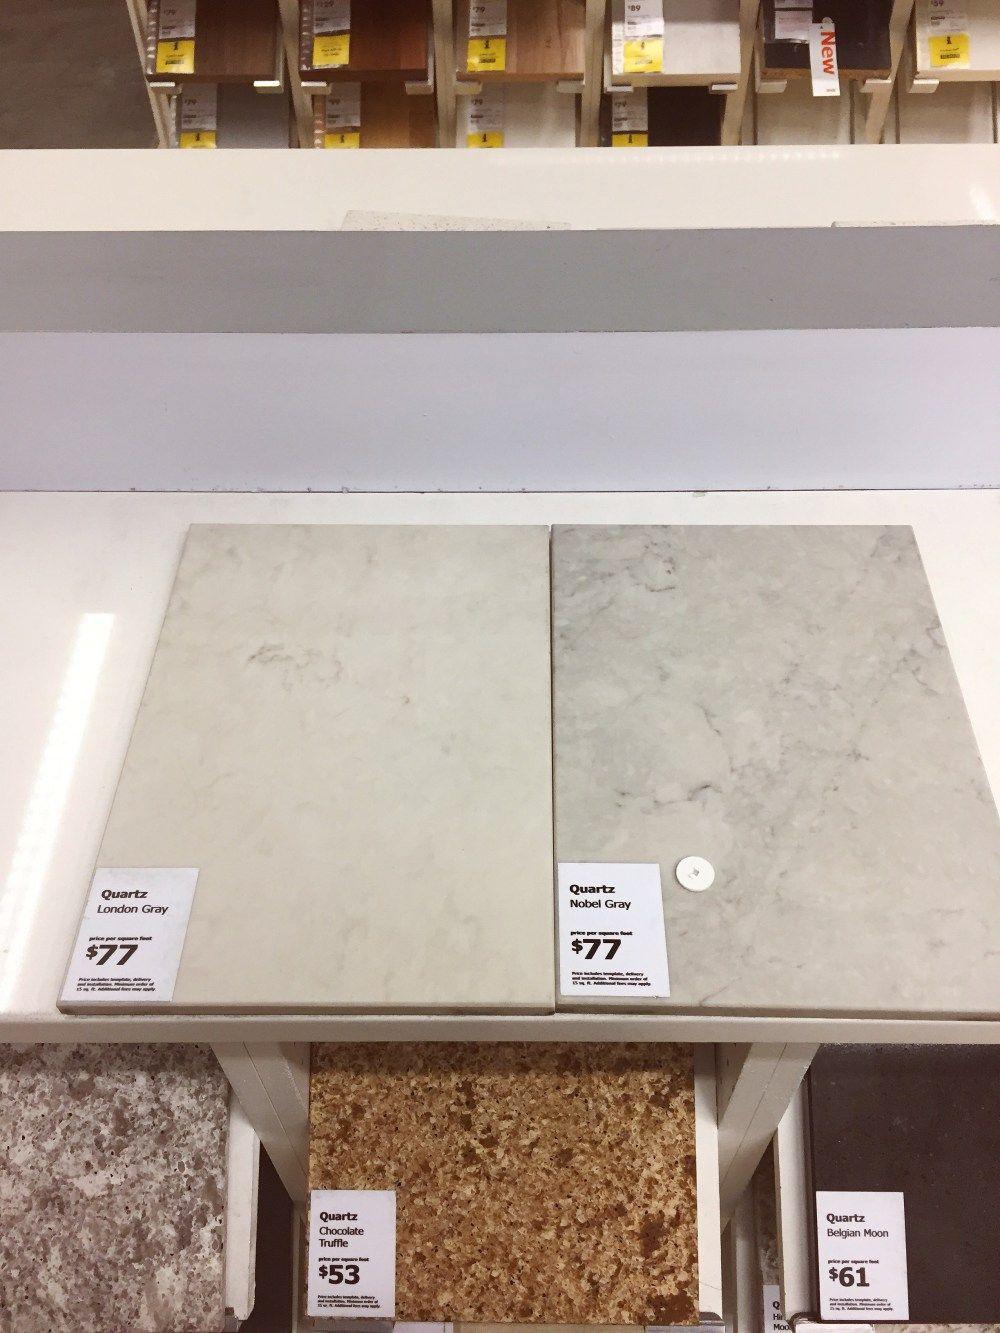 london grey vs nobel grey caesarstone 2017 kitchen living room edit in 2019 grey. Black Bedroom Furniture Sets. Home Design Ideas